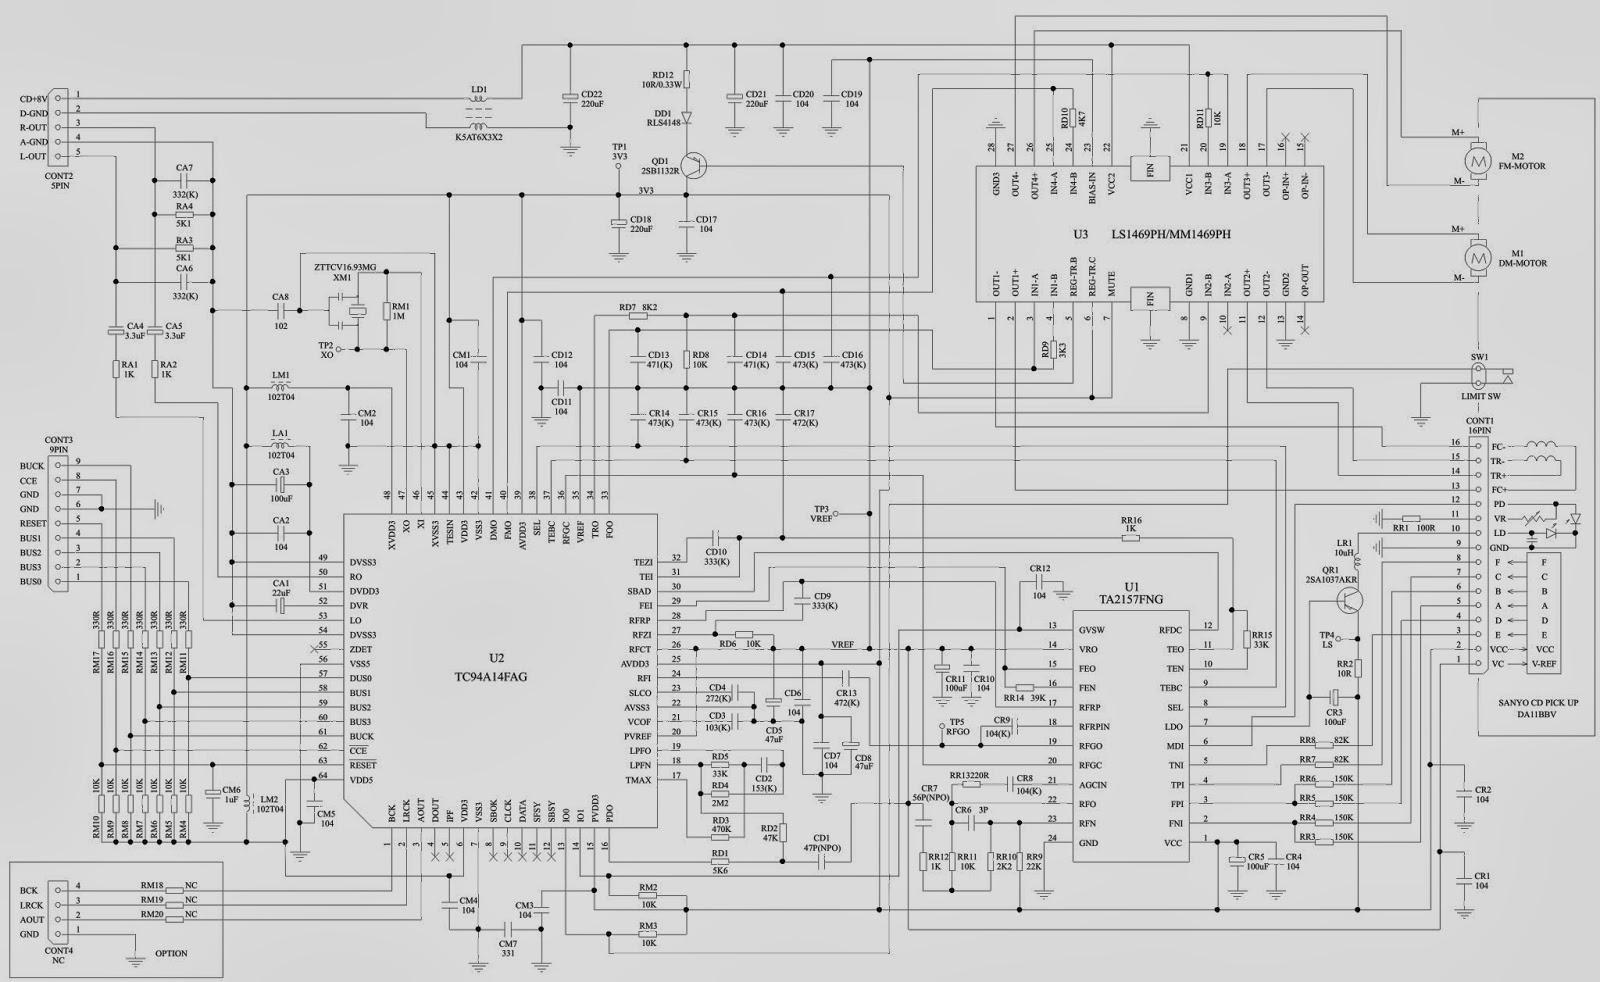 philco msp200 - micro-system - schematic diagram